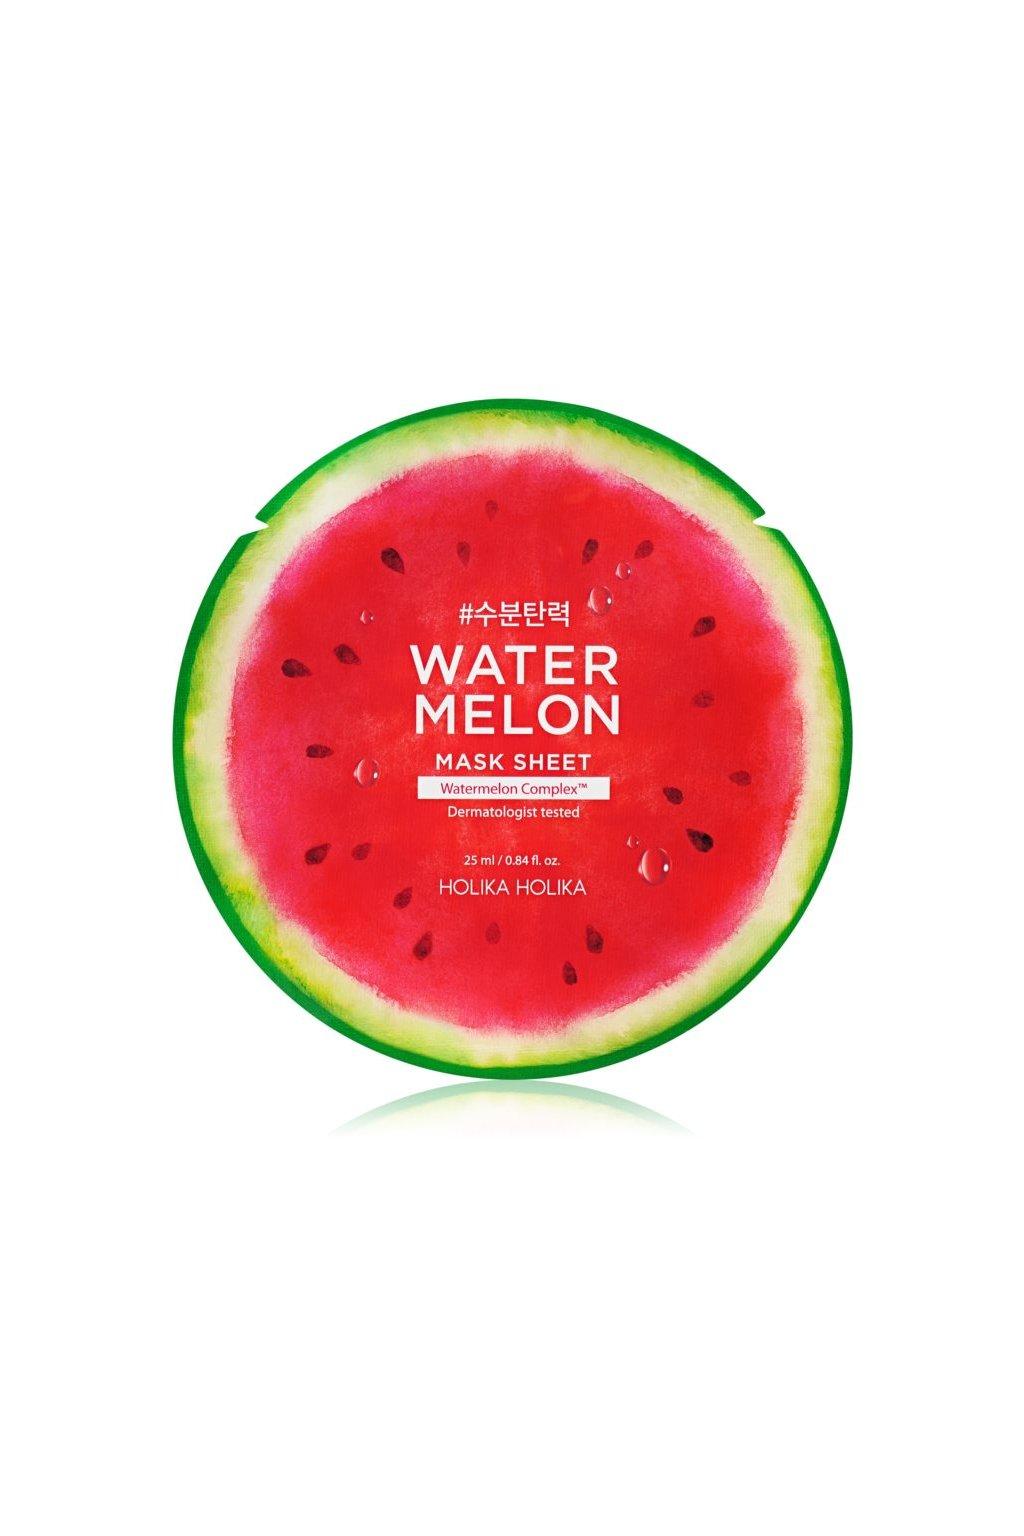 holika holika watermelon mask platynkova maska s hydratacnim a zklidnujicim ucinkem